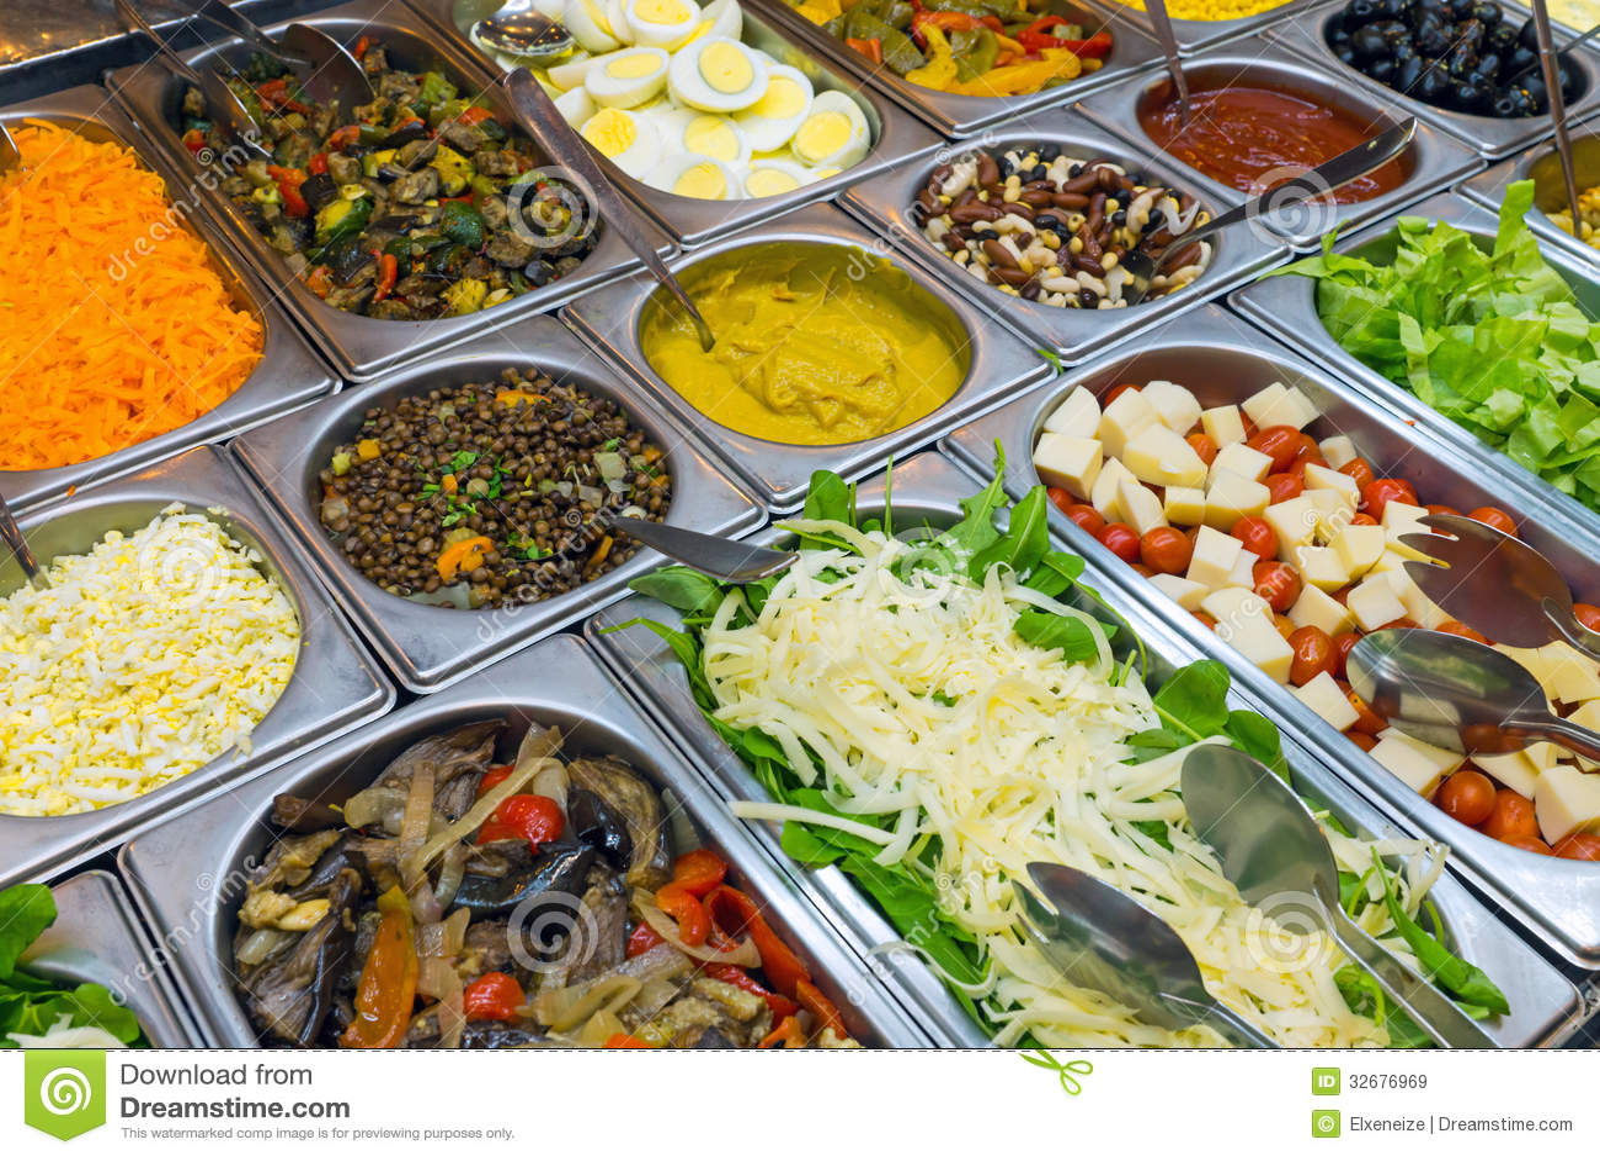 fine salad buffet stock image image of counter eggplant. Black Bedroom Furniture Sets. Home Design Ideas